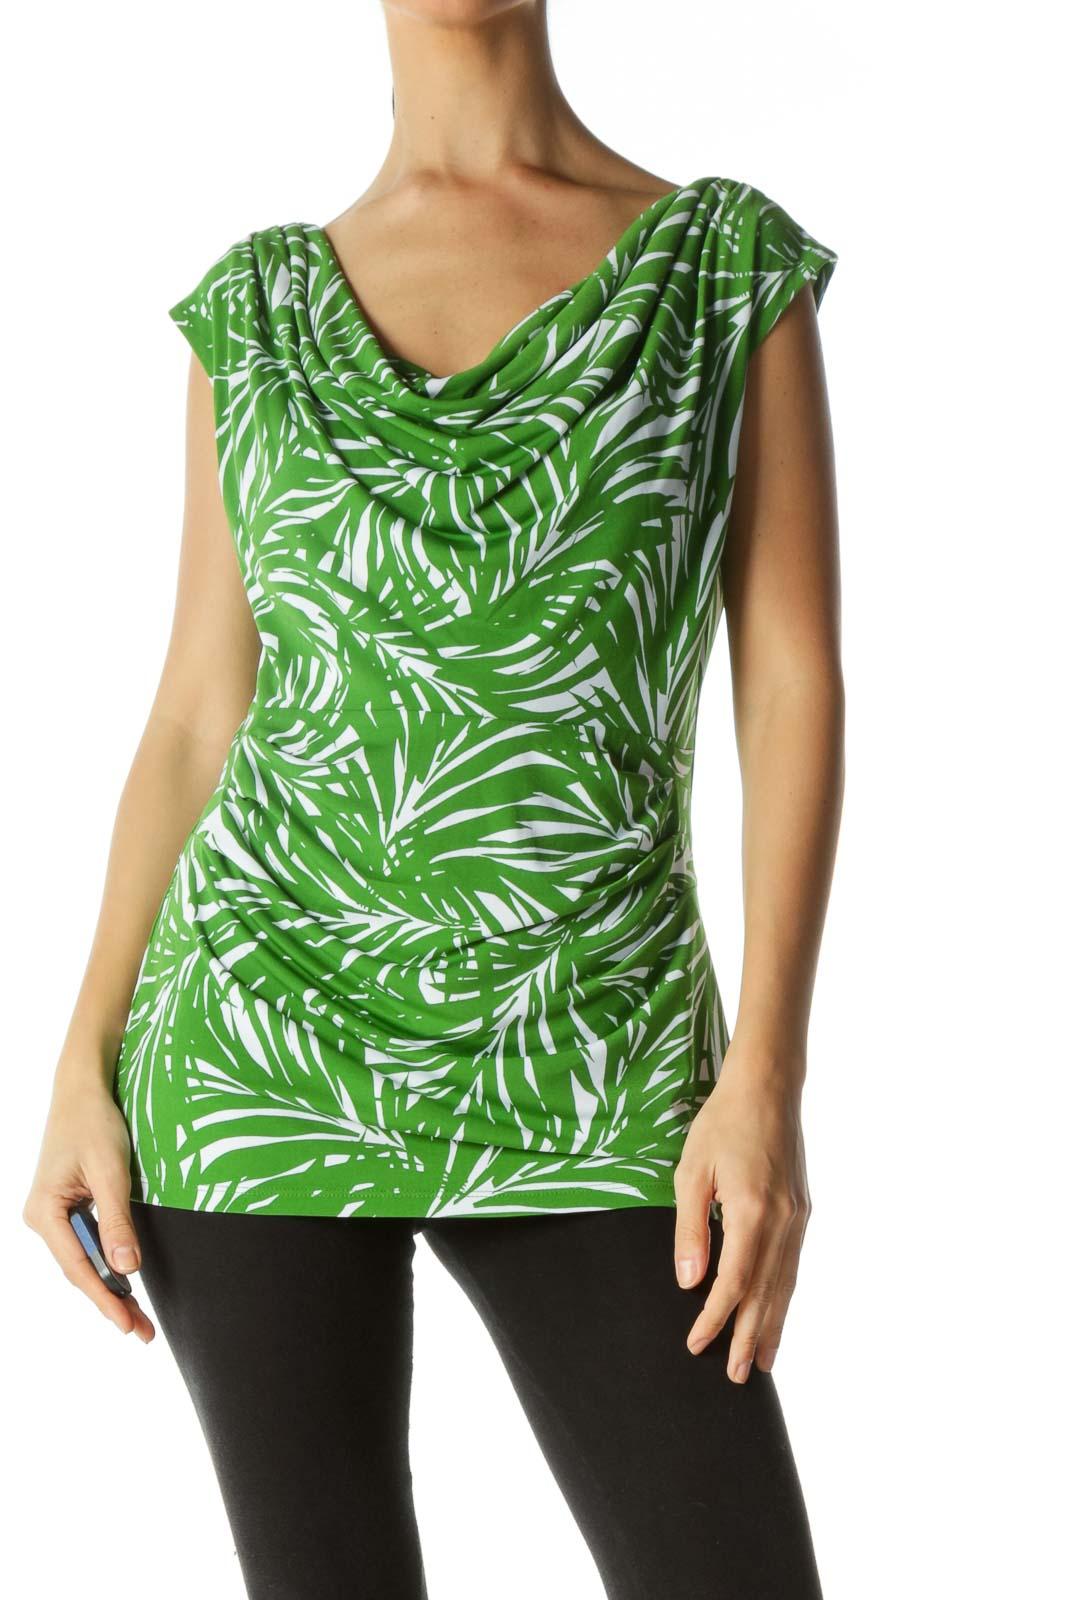 Green White Palm Leaves Print Stretch Tank Top